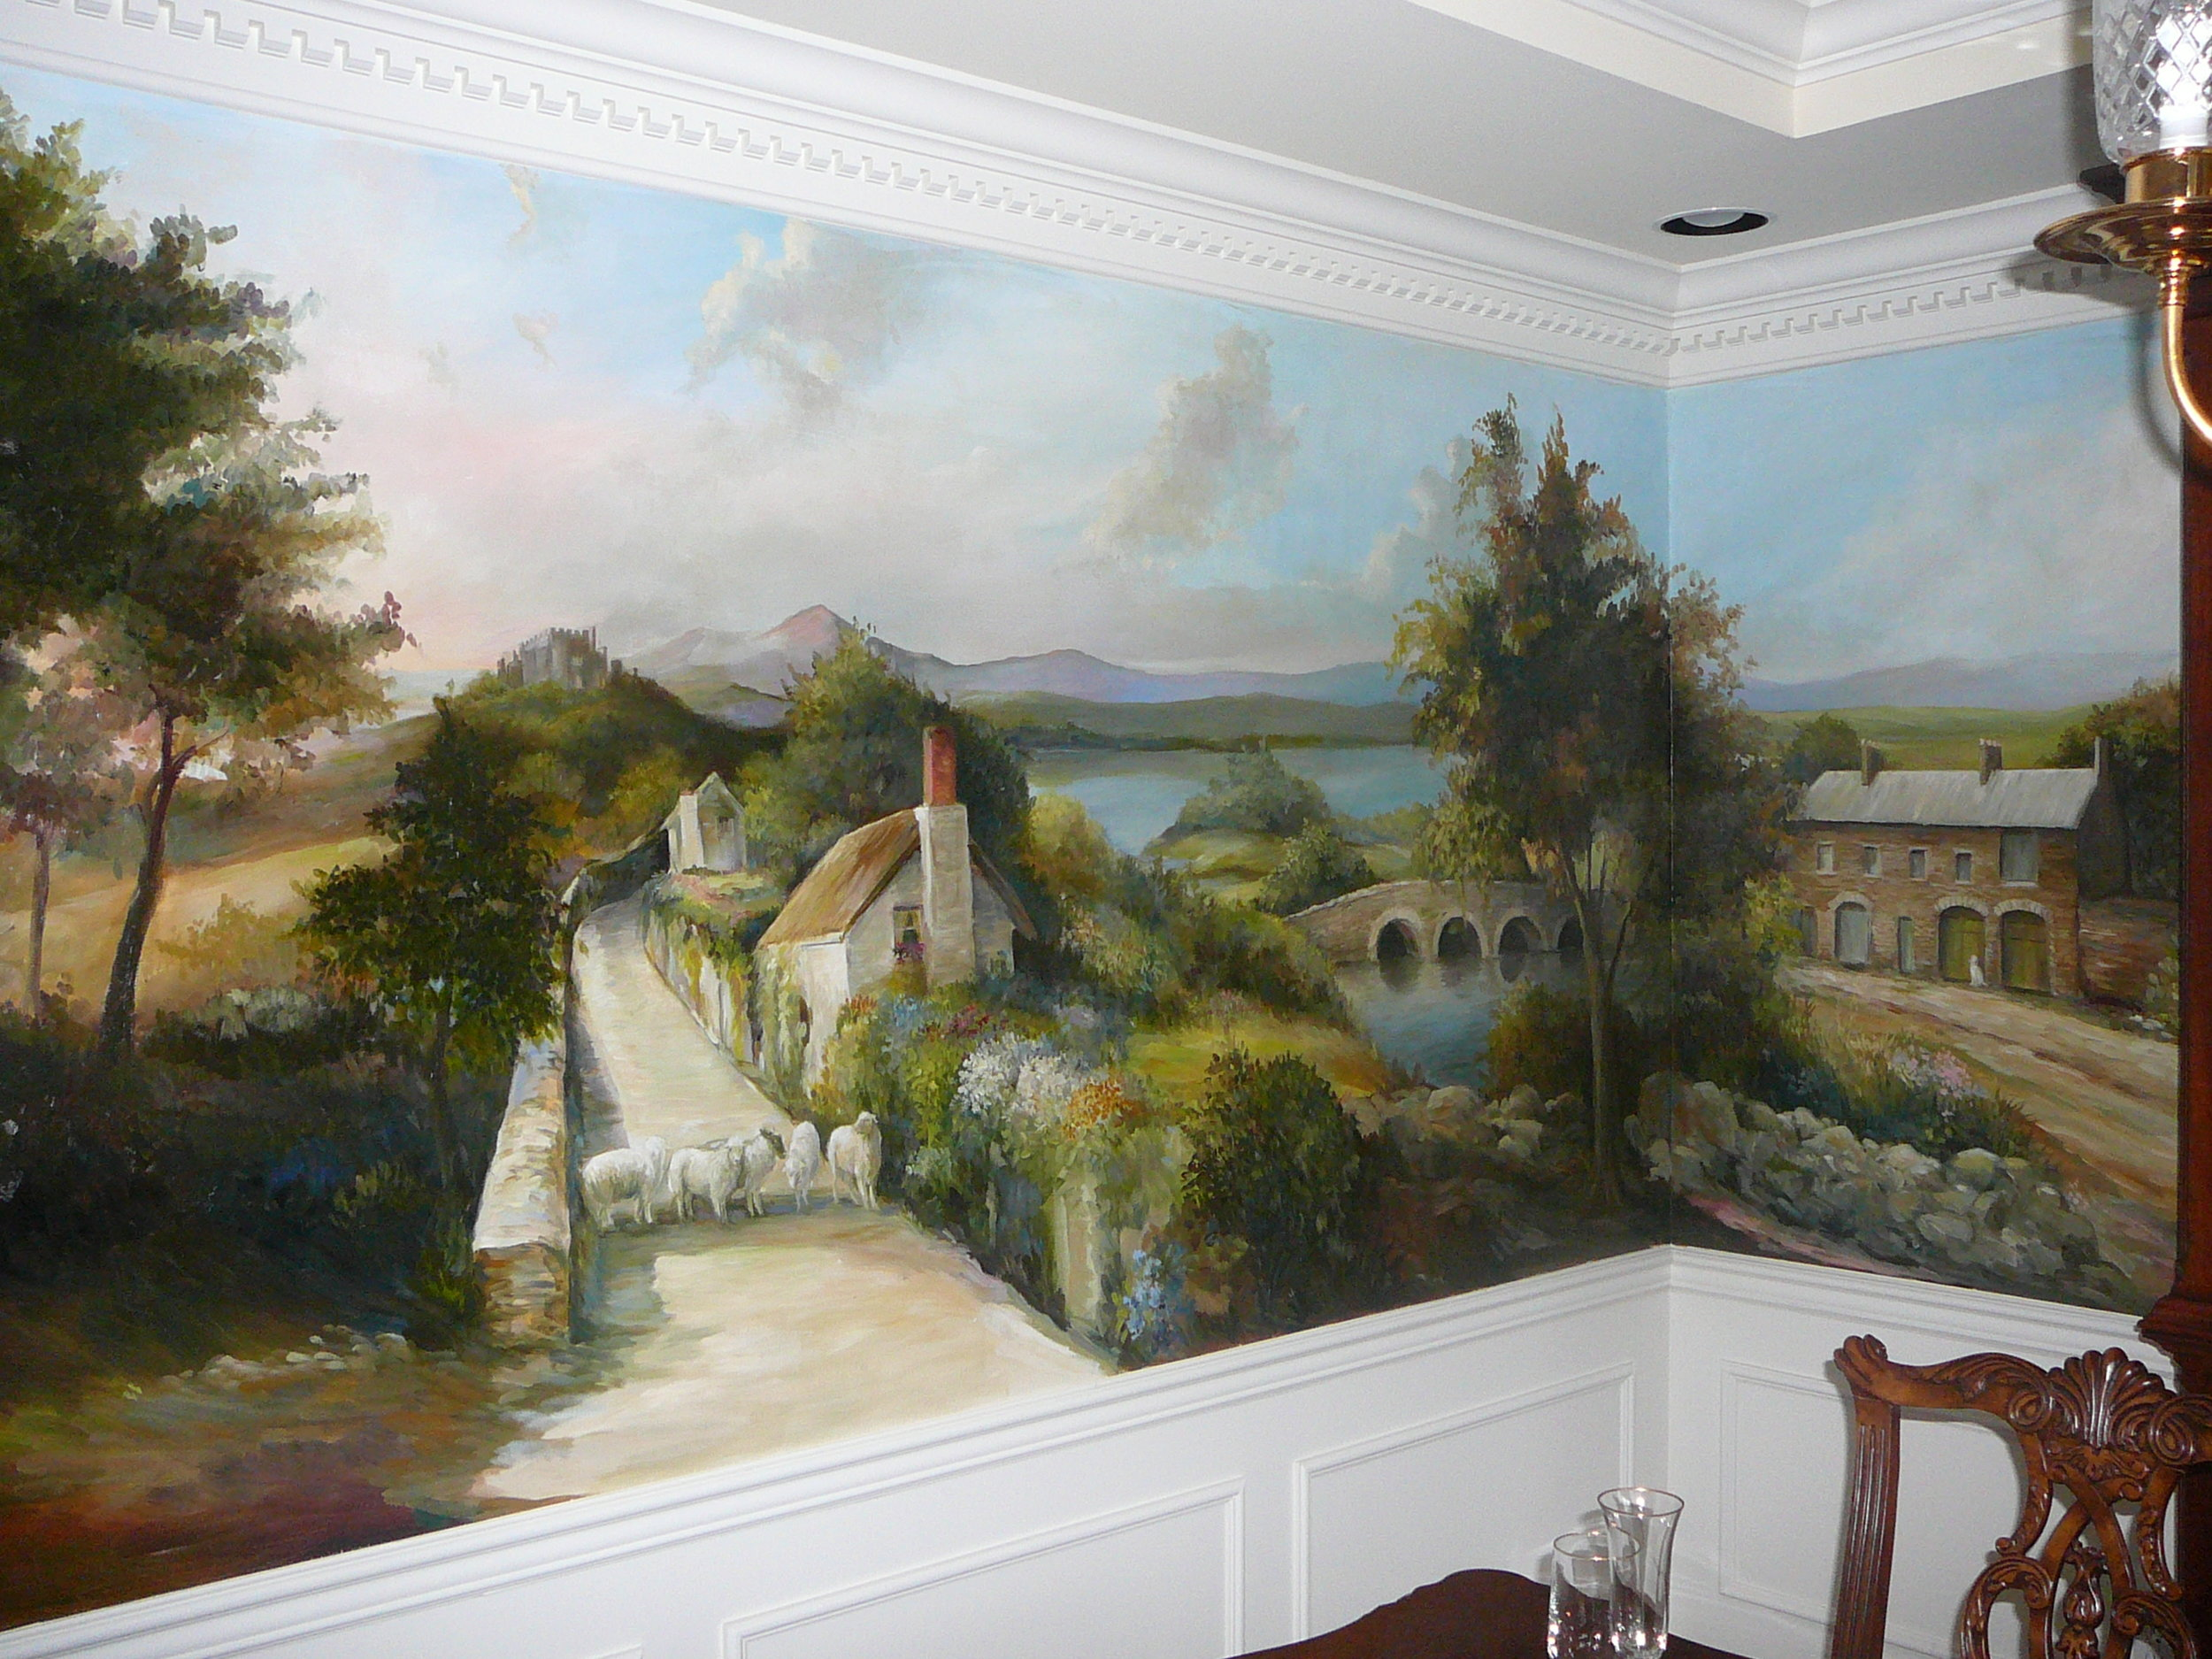 Copy of Irish Mural 4 full view 008.jpg